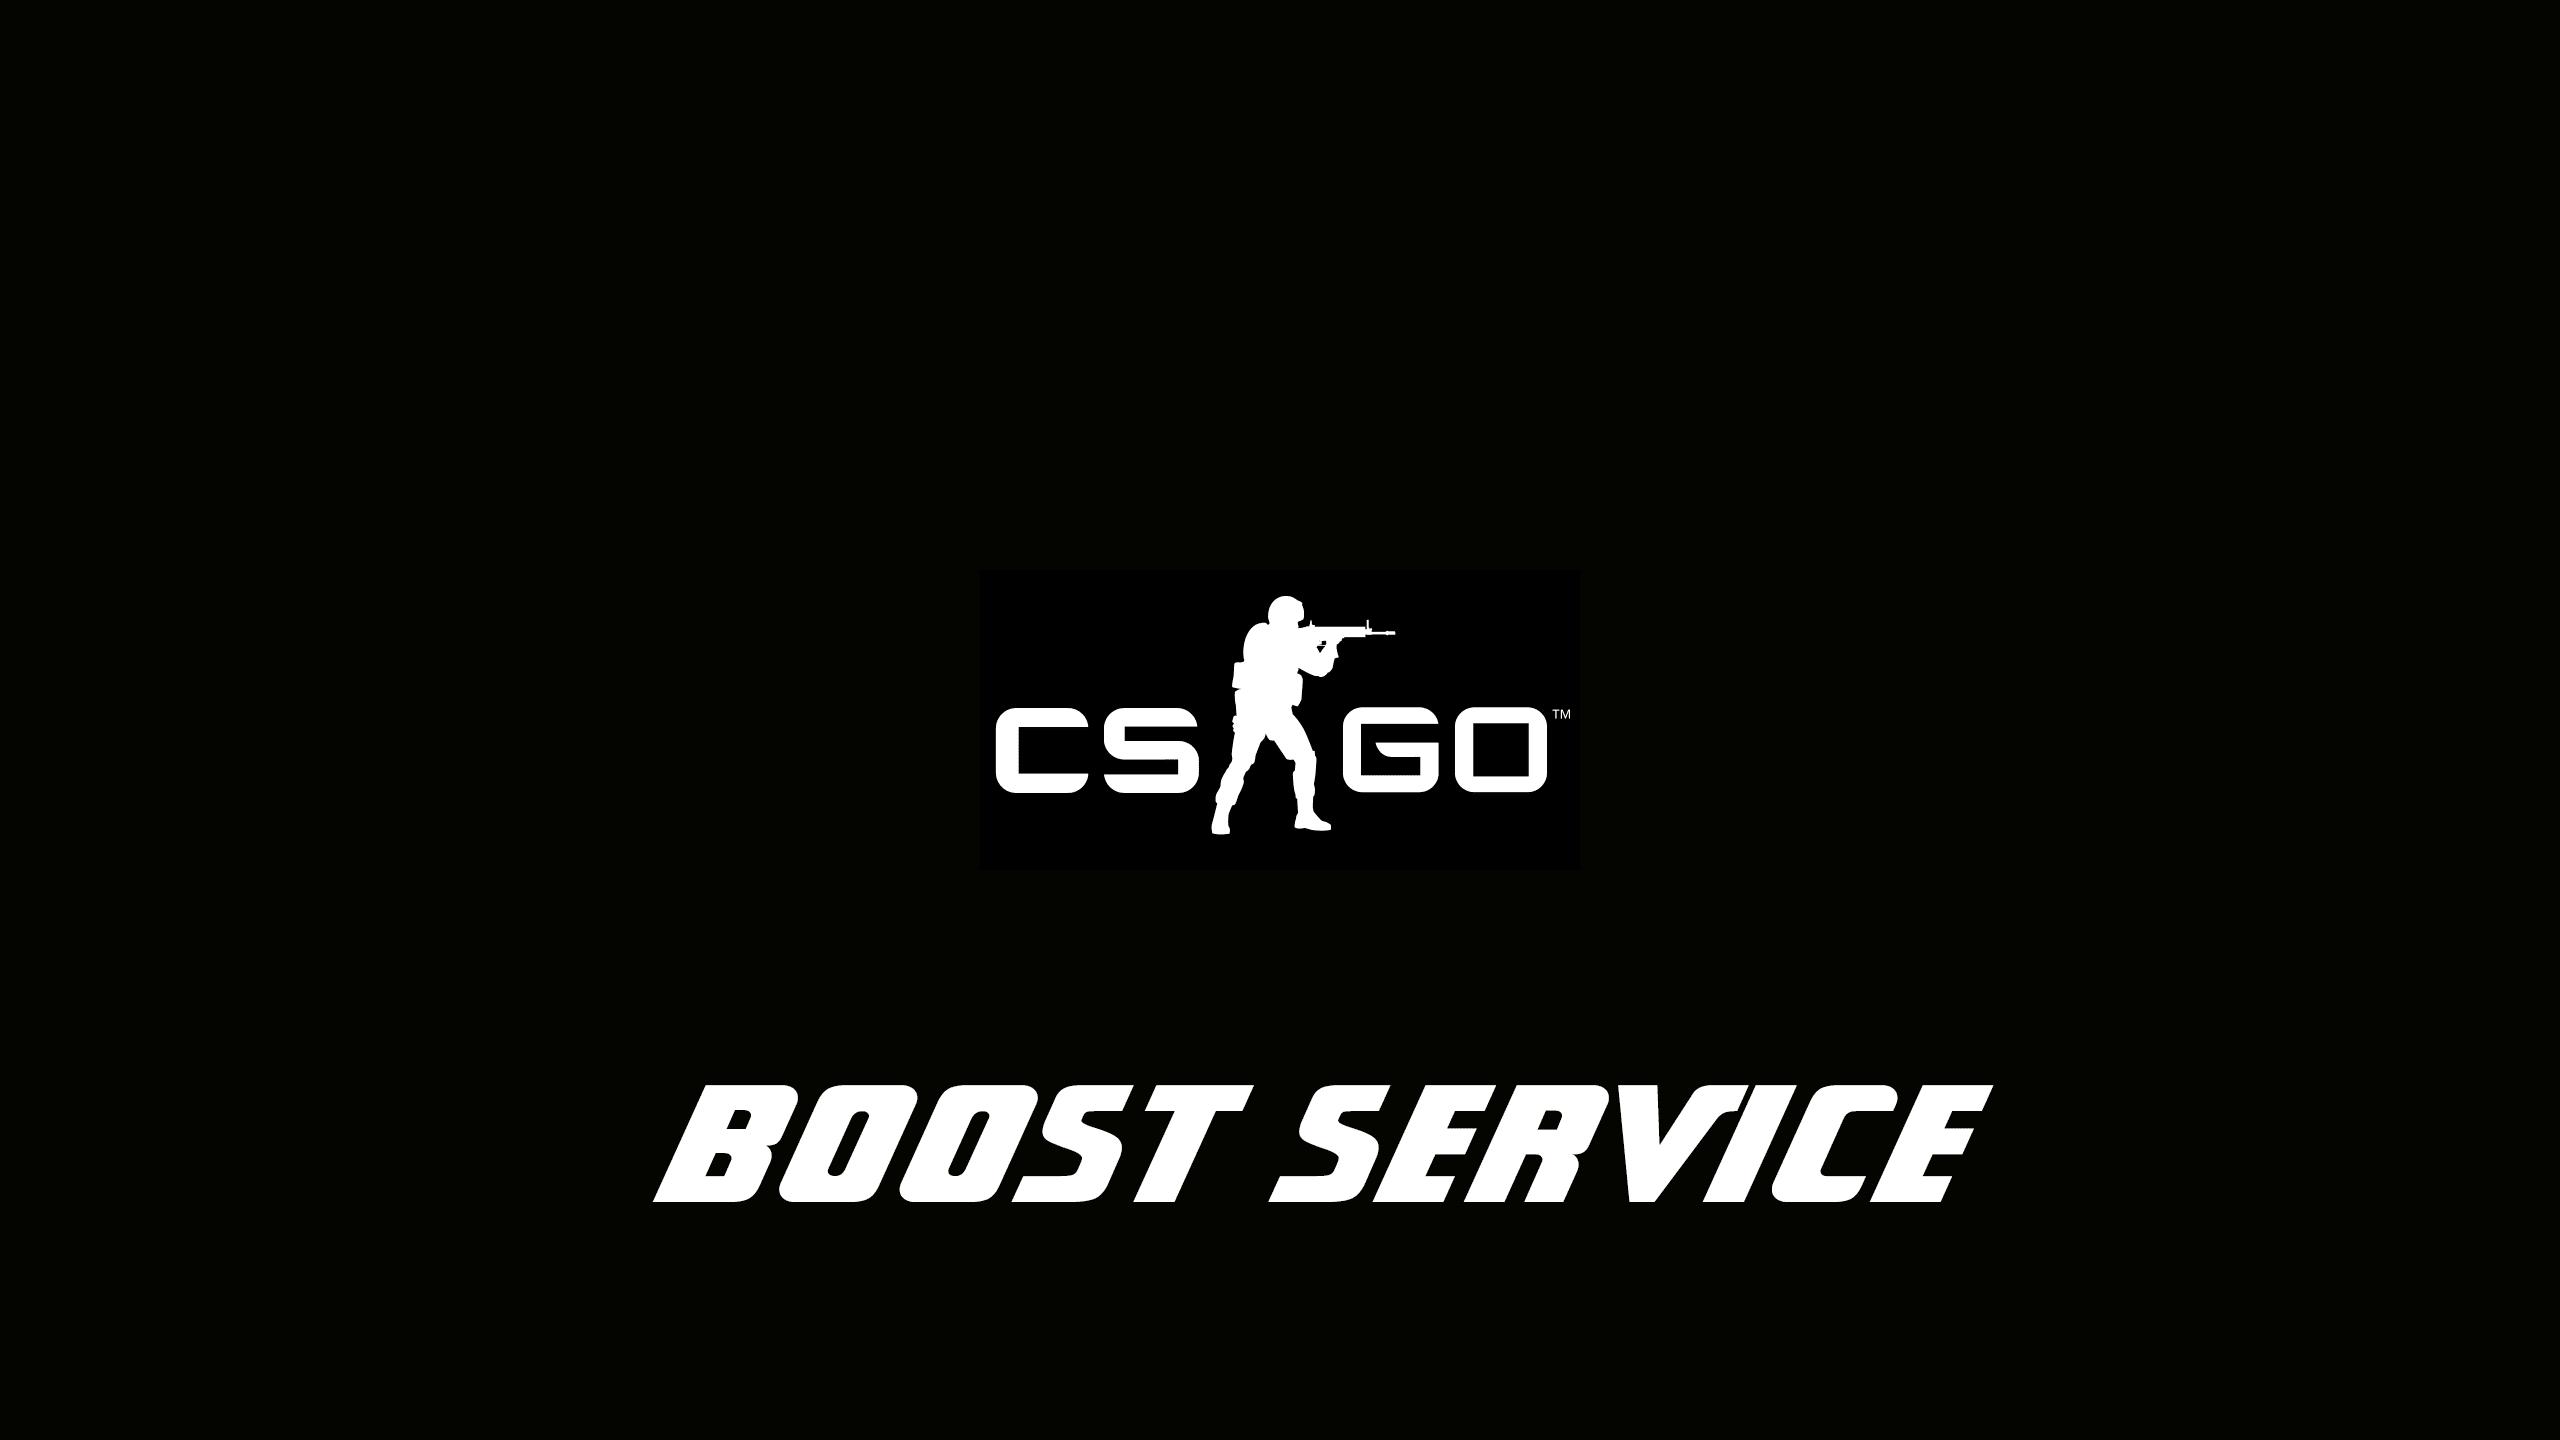 csgo boosting